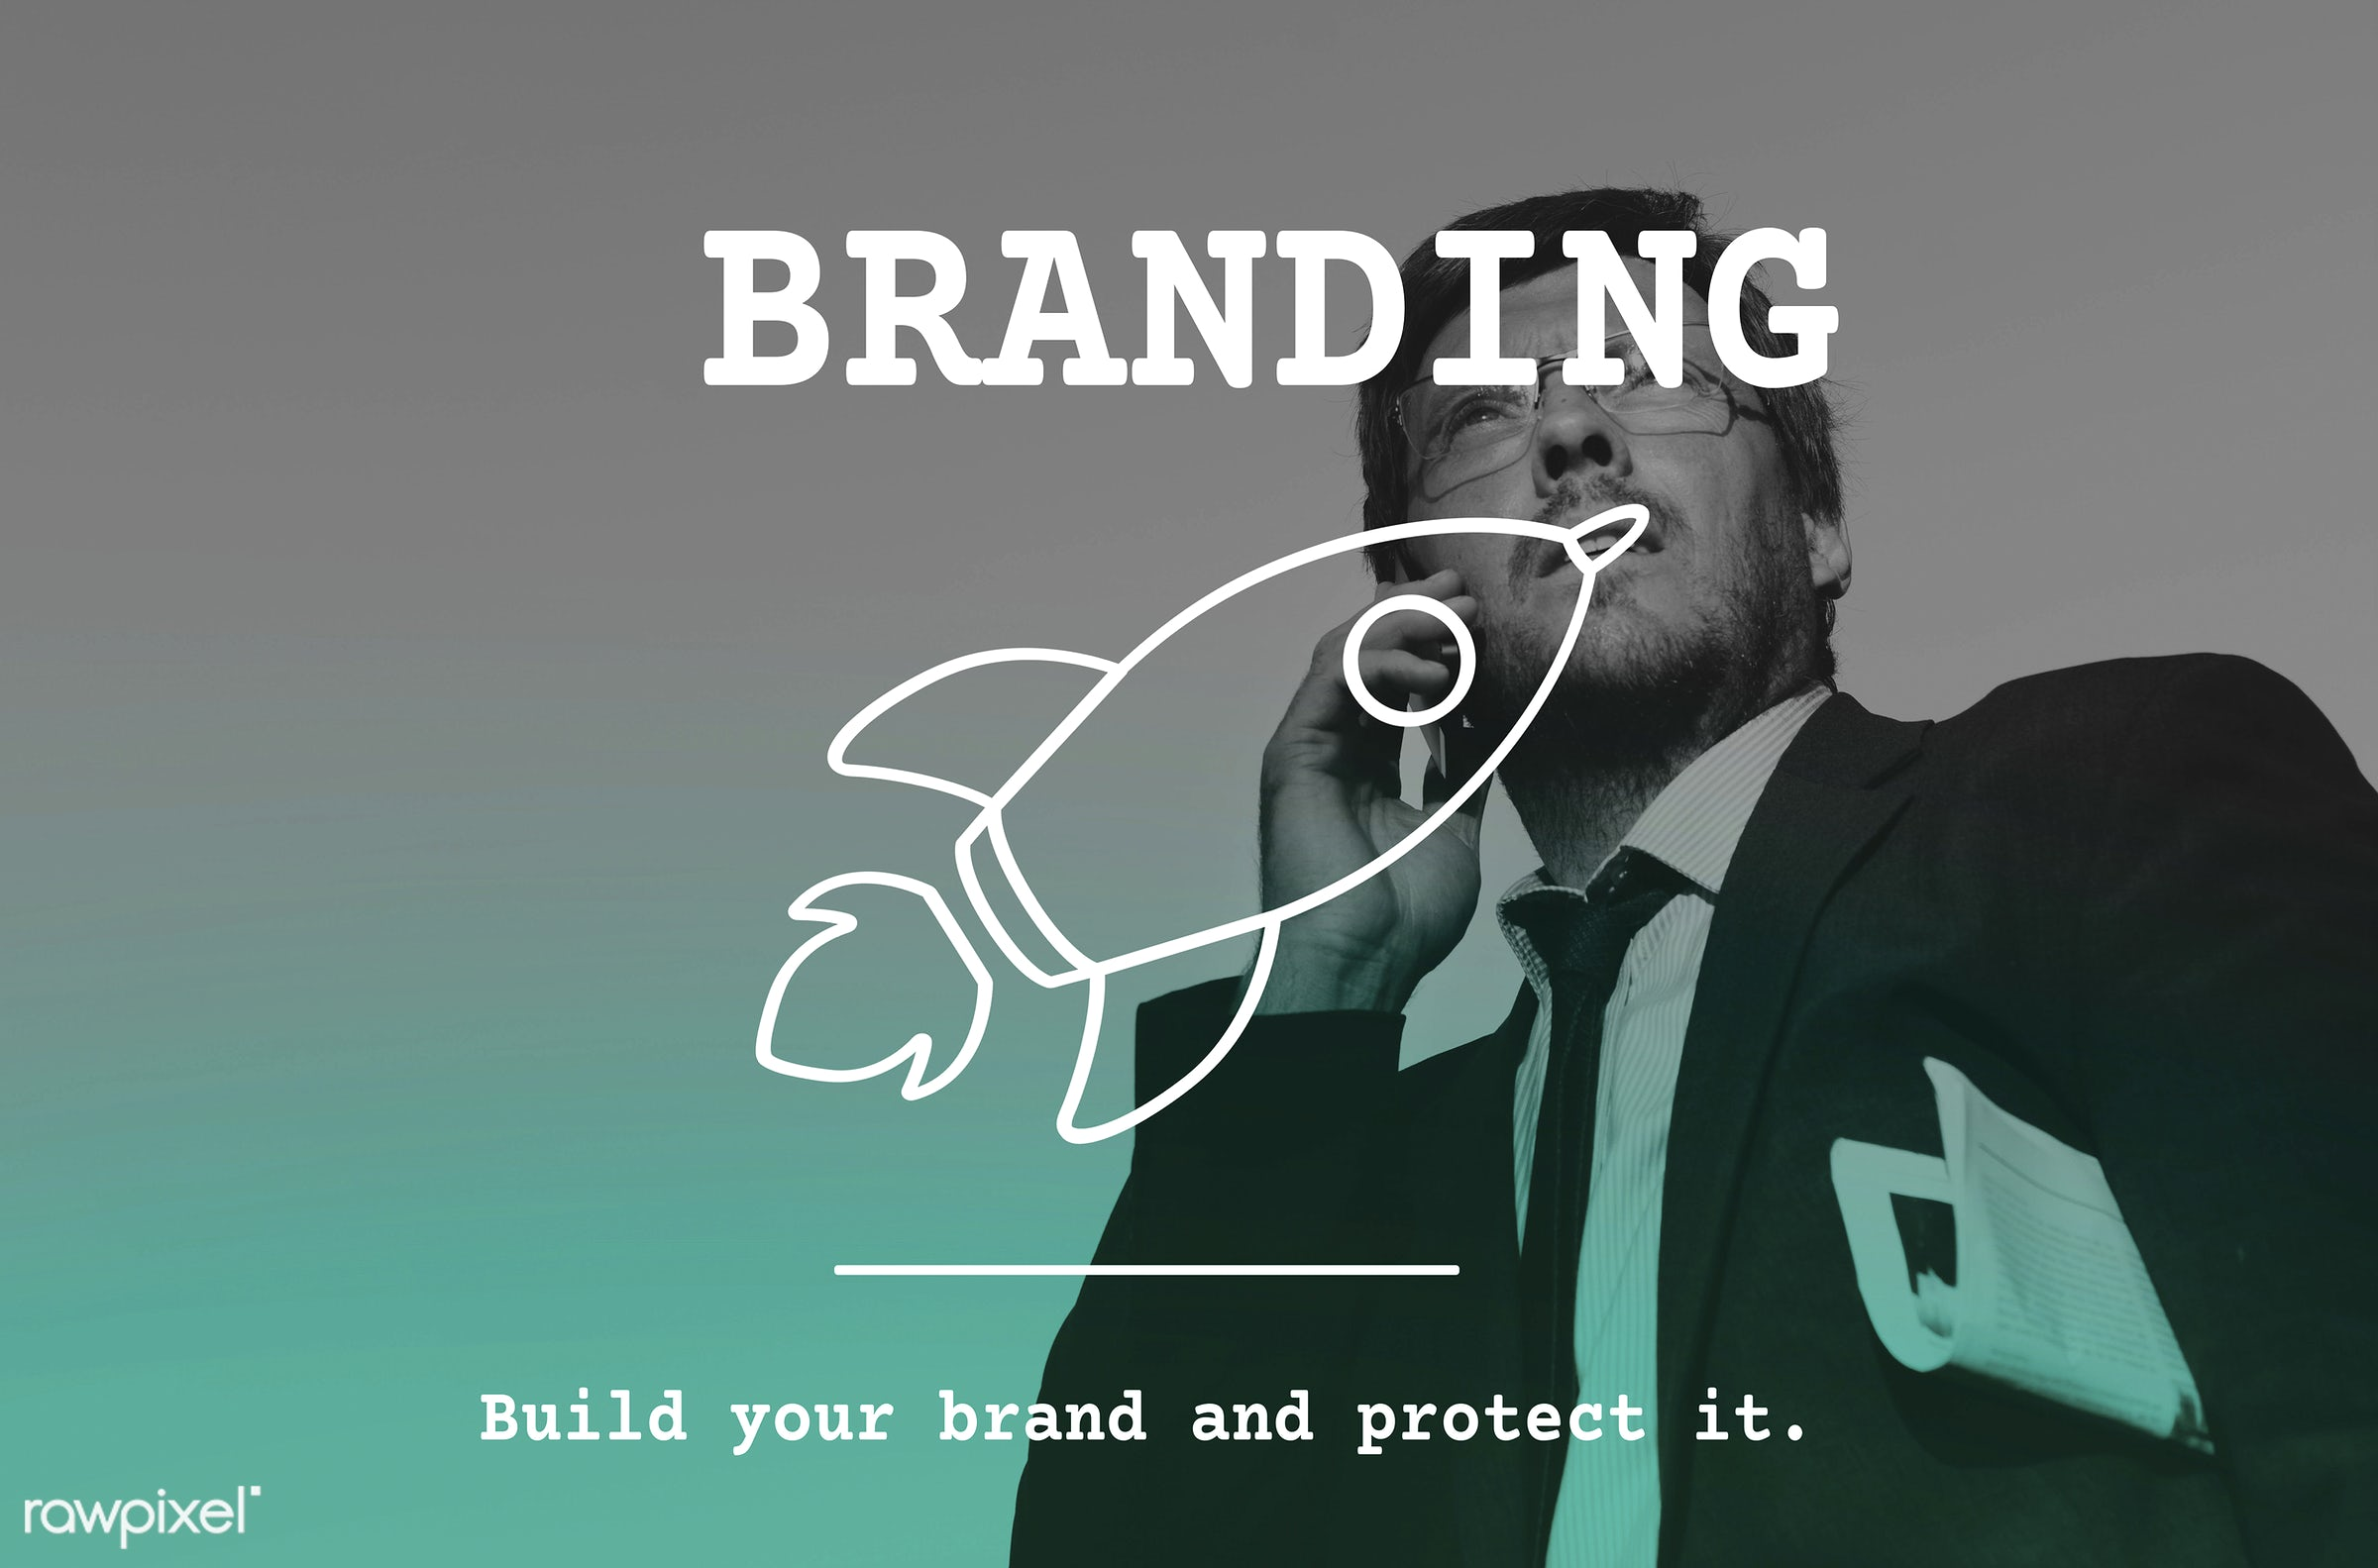 adult, branding, business, businessmen, captionadded, caucasian, cellphone, communication, corporate, england, finance,...